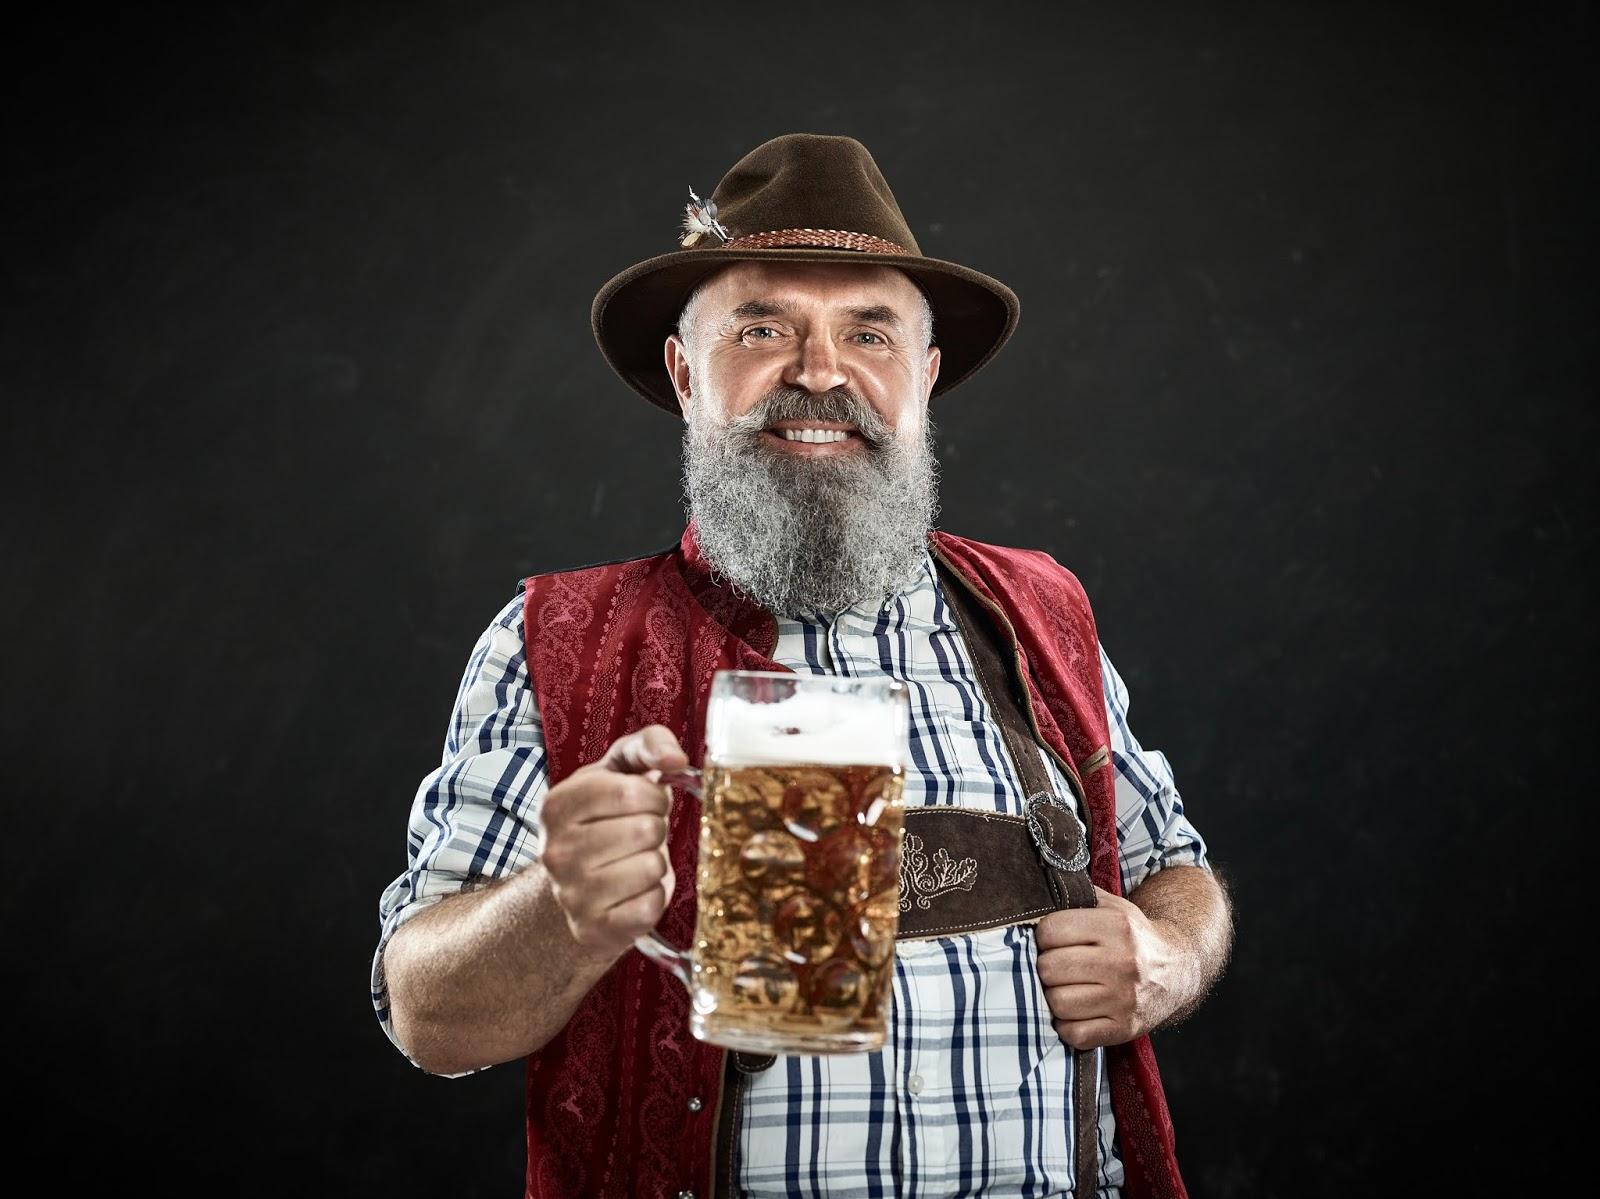 Hilft Bier Gegen Corona